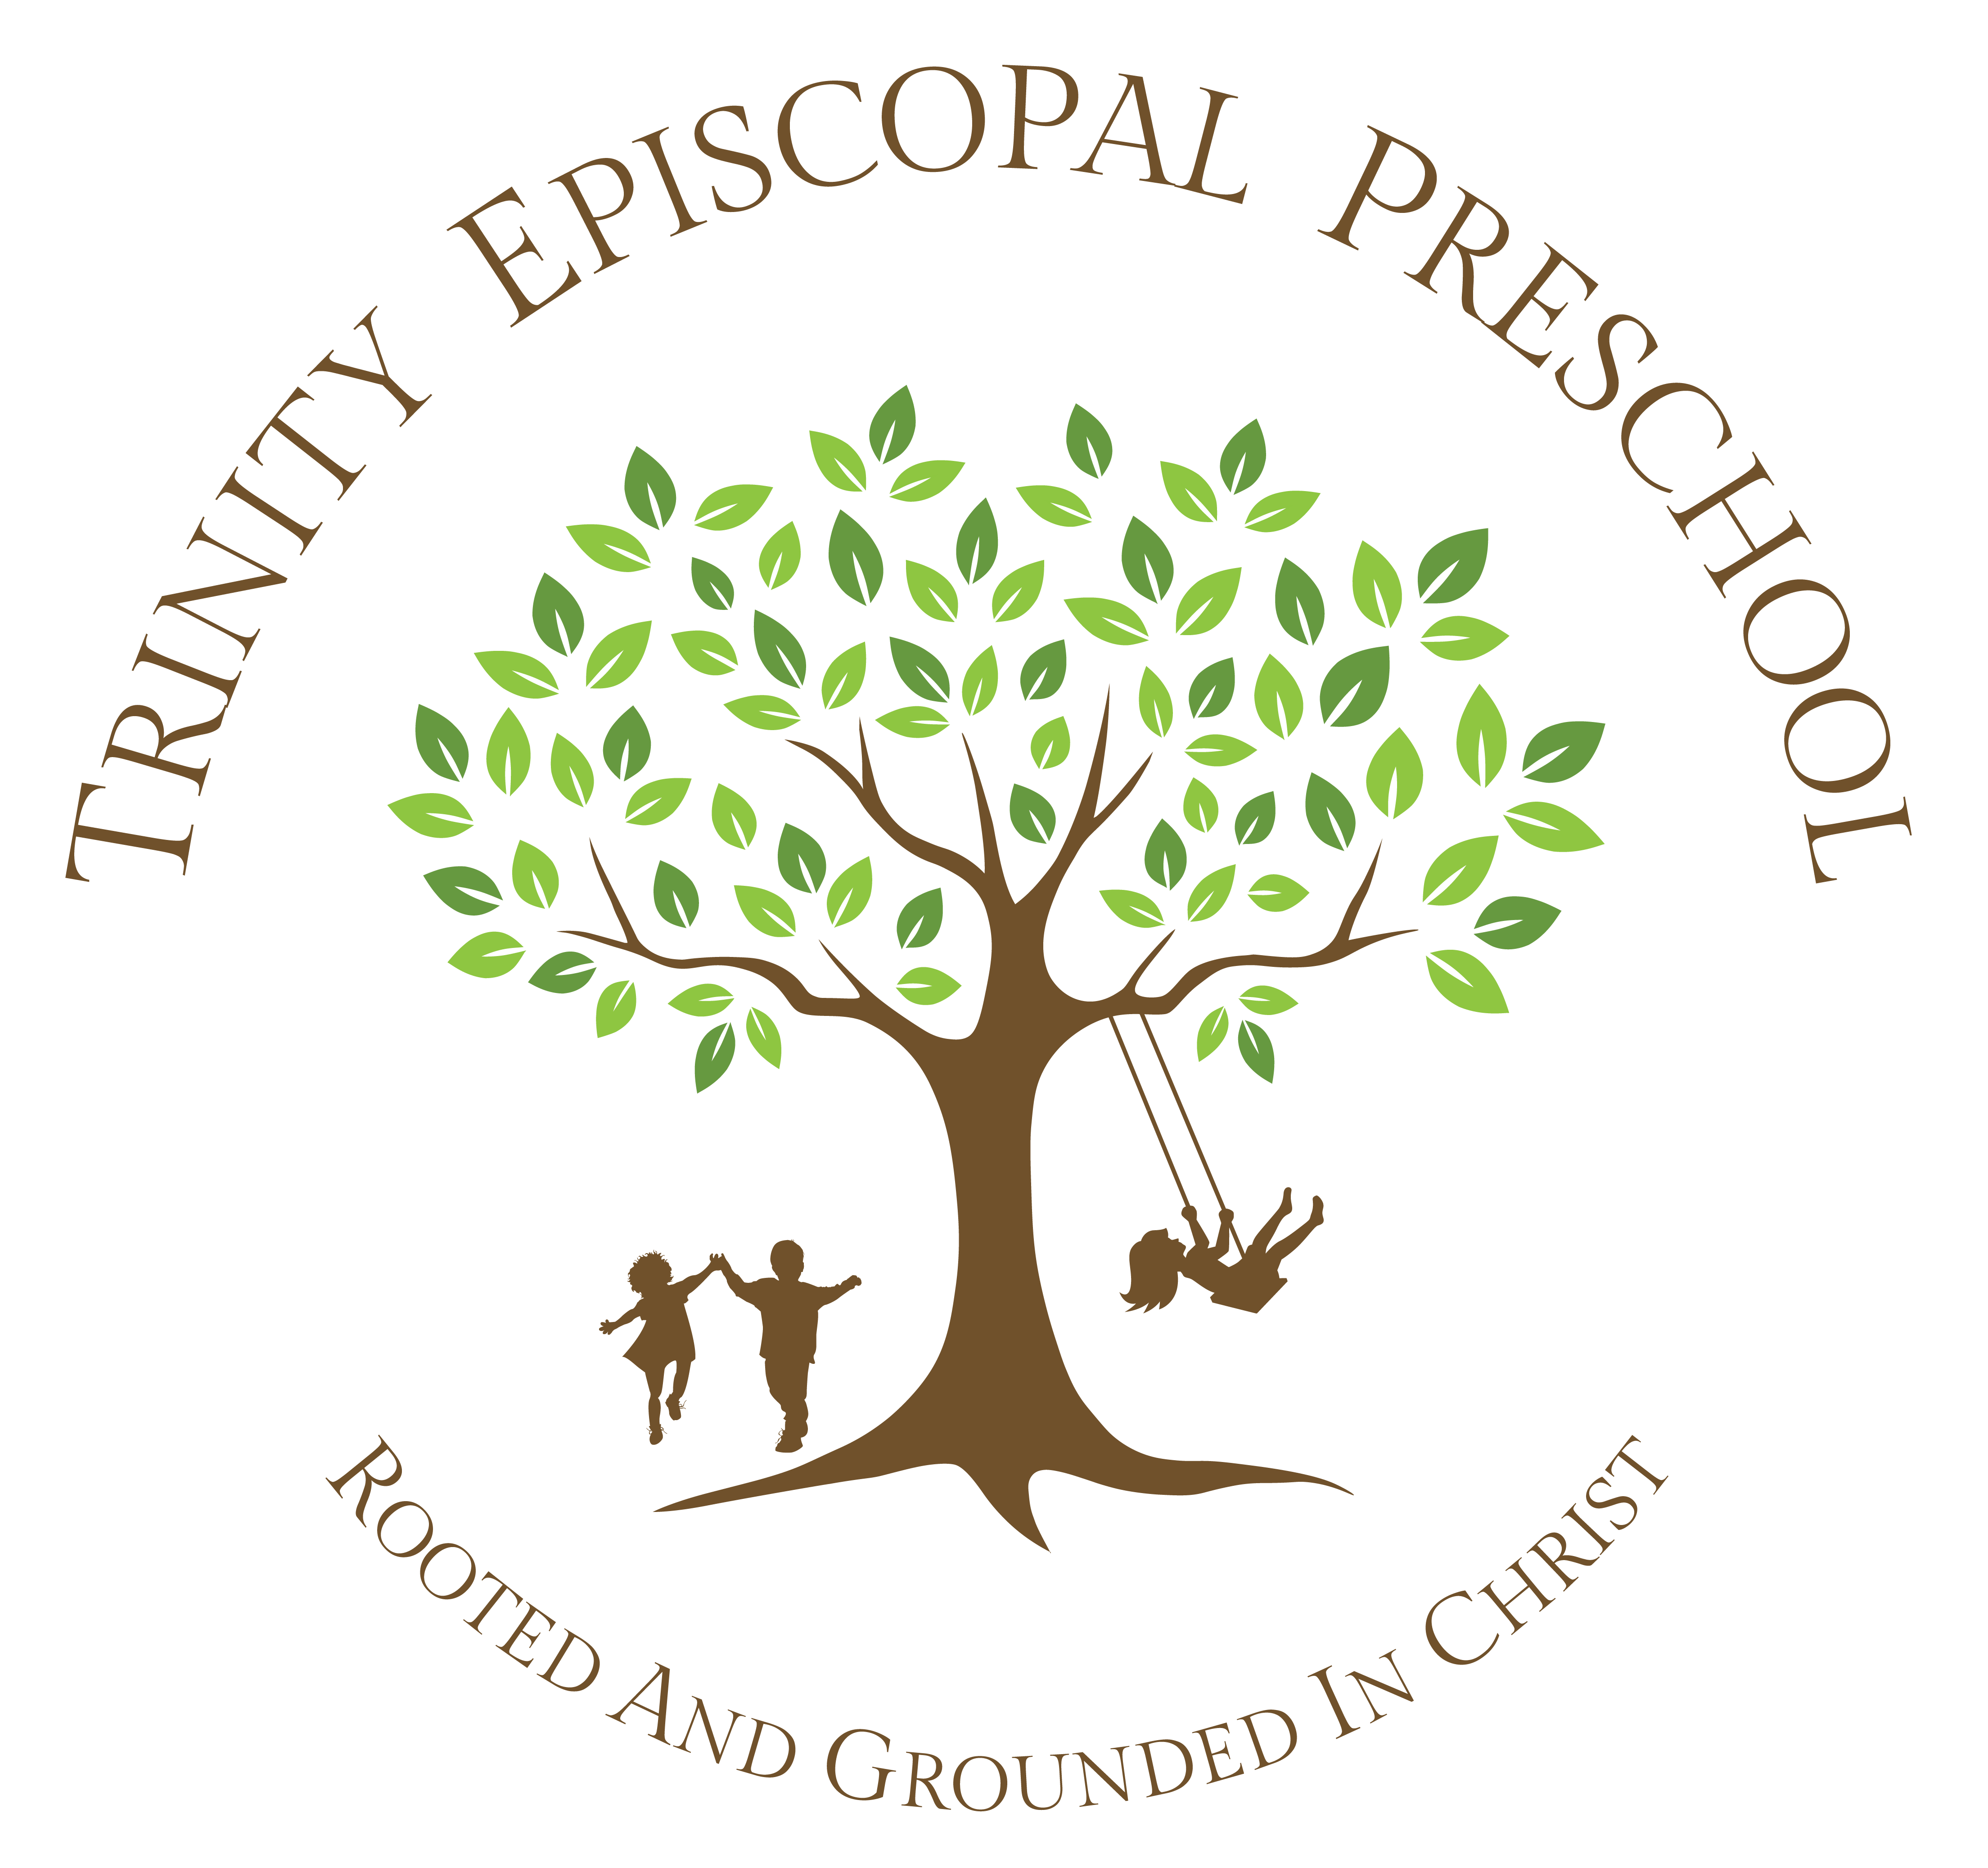 Trinity Episcopal Preschool